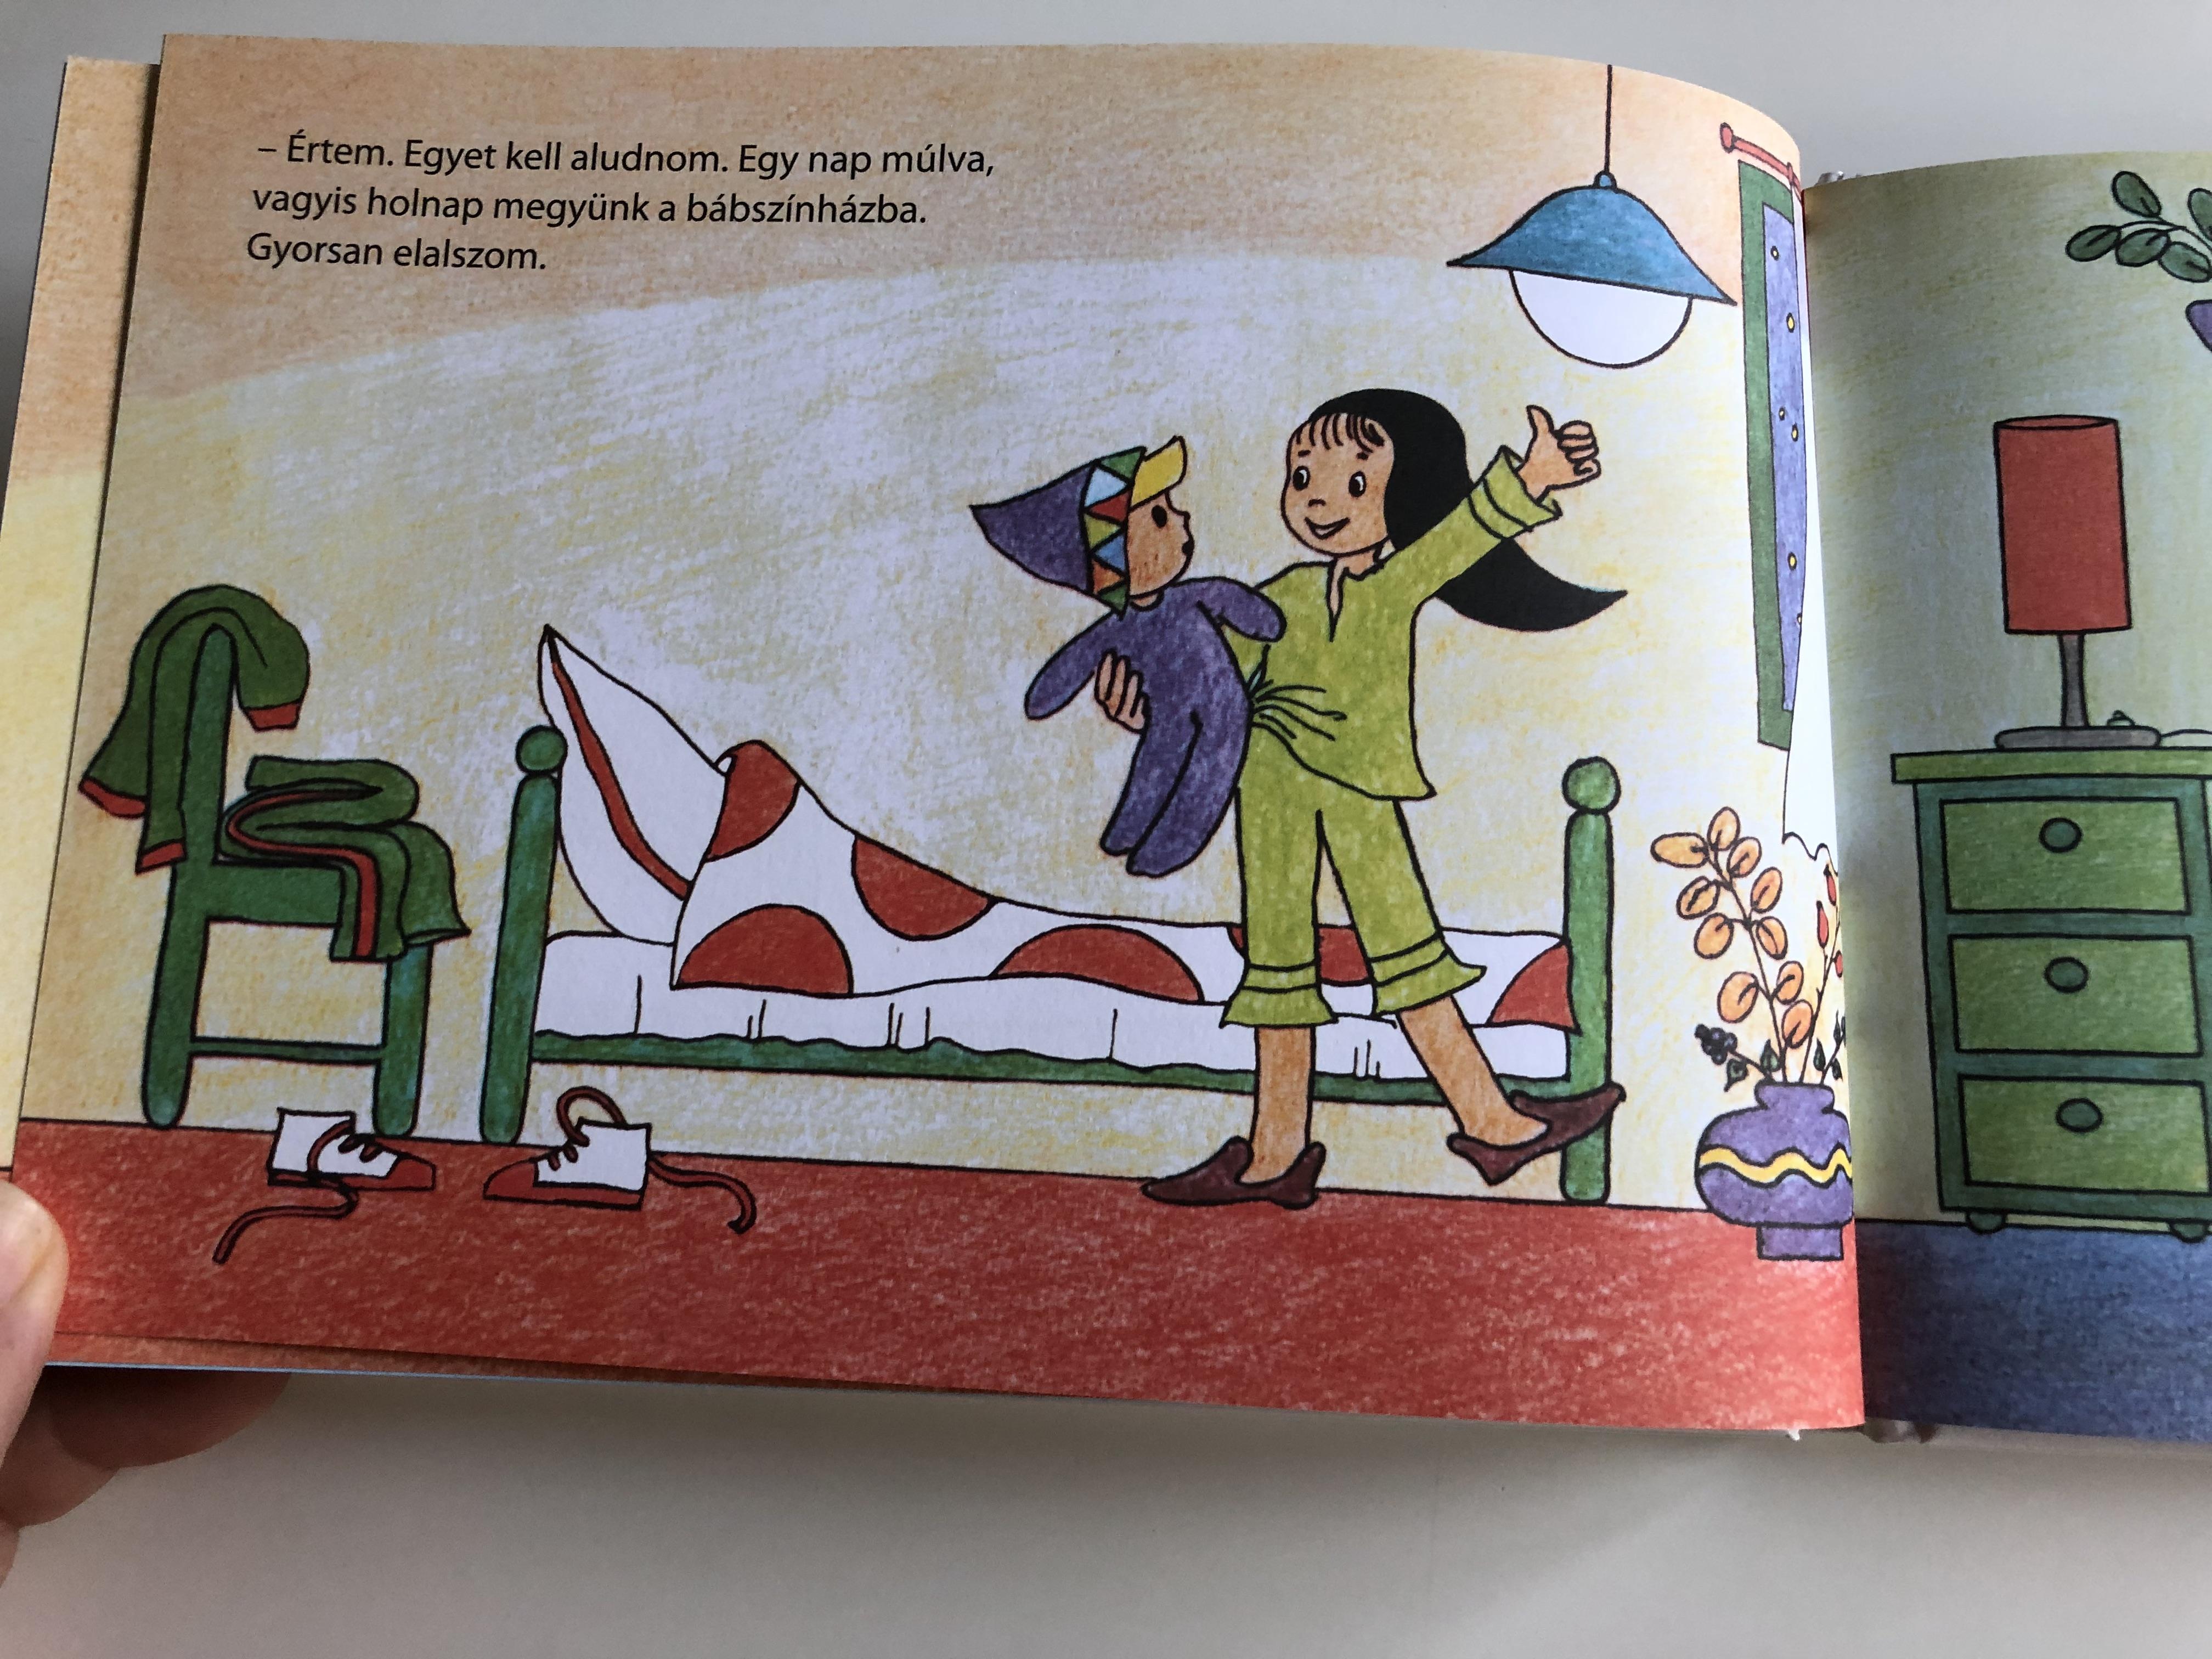 tegnap-ma-holnap-by-mar-k-veronika-felelget-s-k-nyv-hungarian-language-children-s-book-about-weekdays-m-ra-k-nyvkiad-2011-6-.jpg